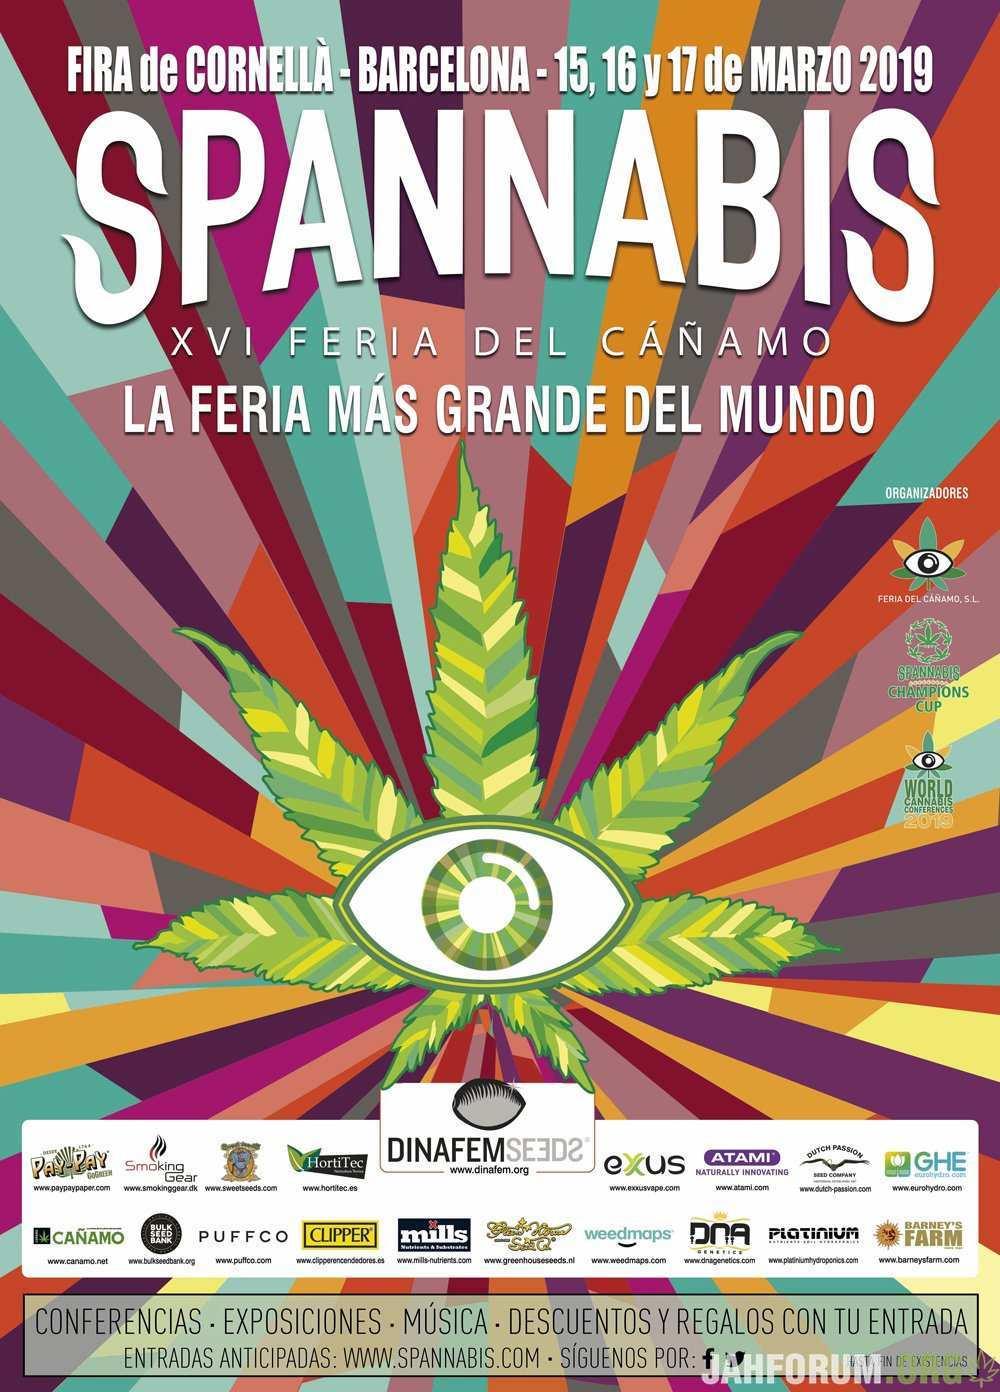 Spannabis 2019 Barcelona edition / Спаннабис 2019